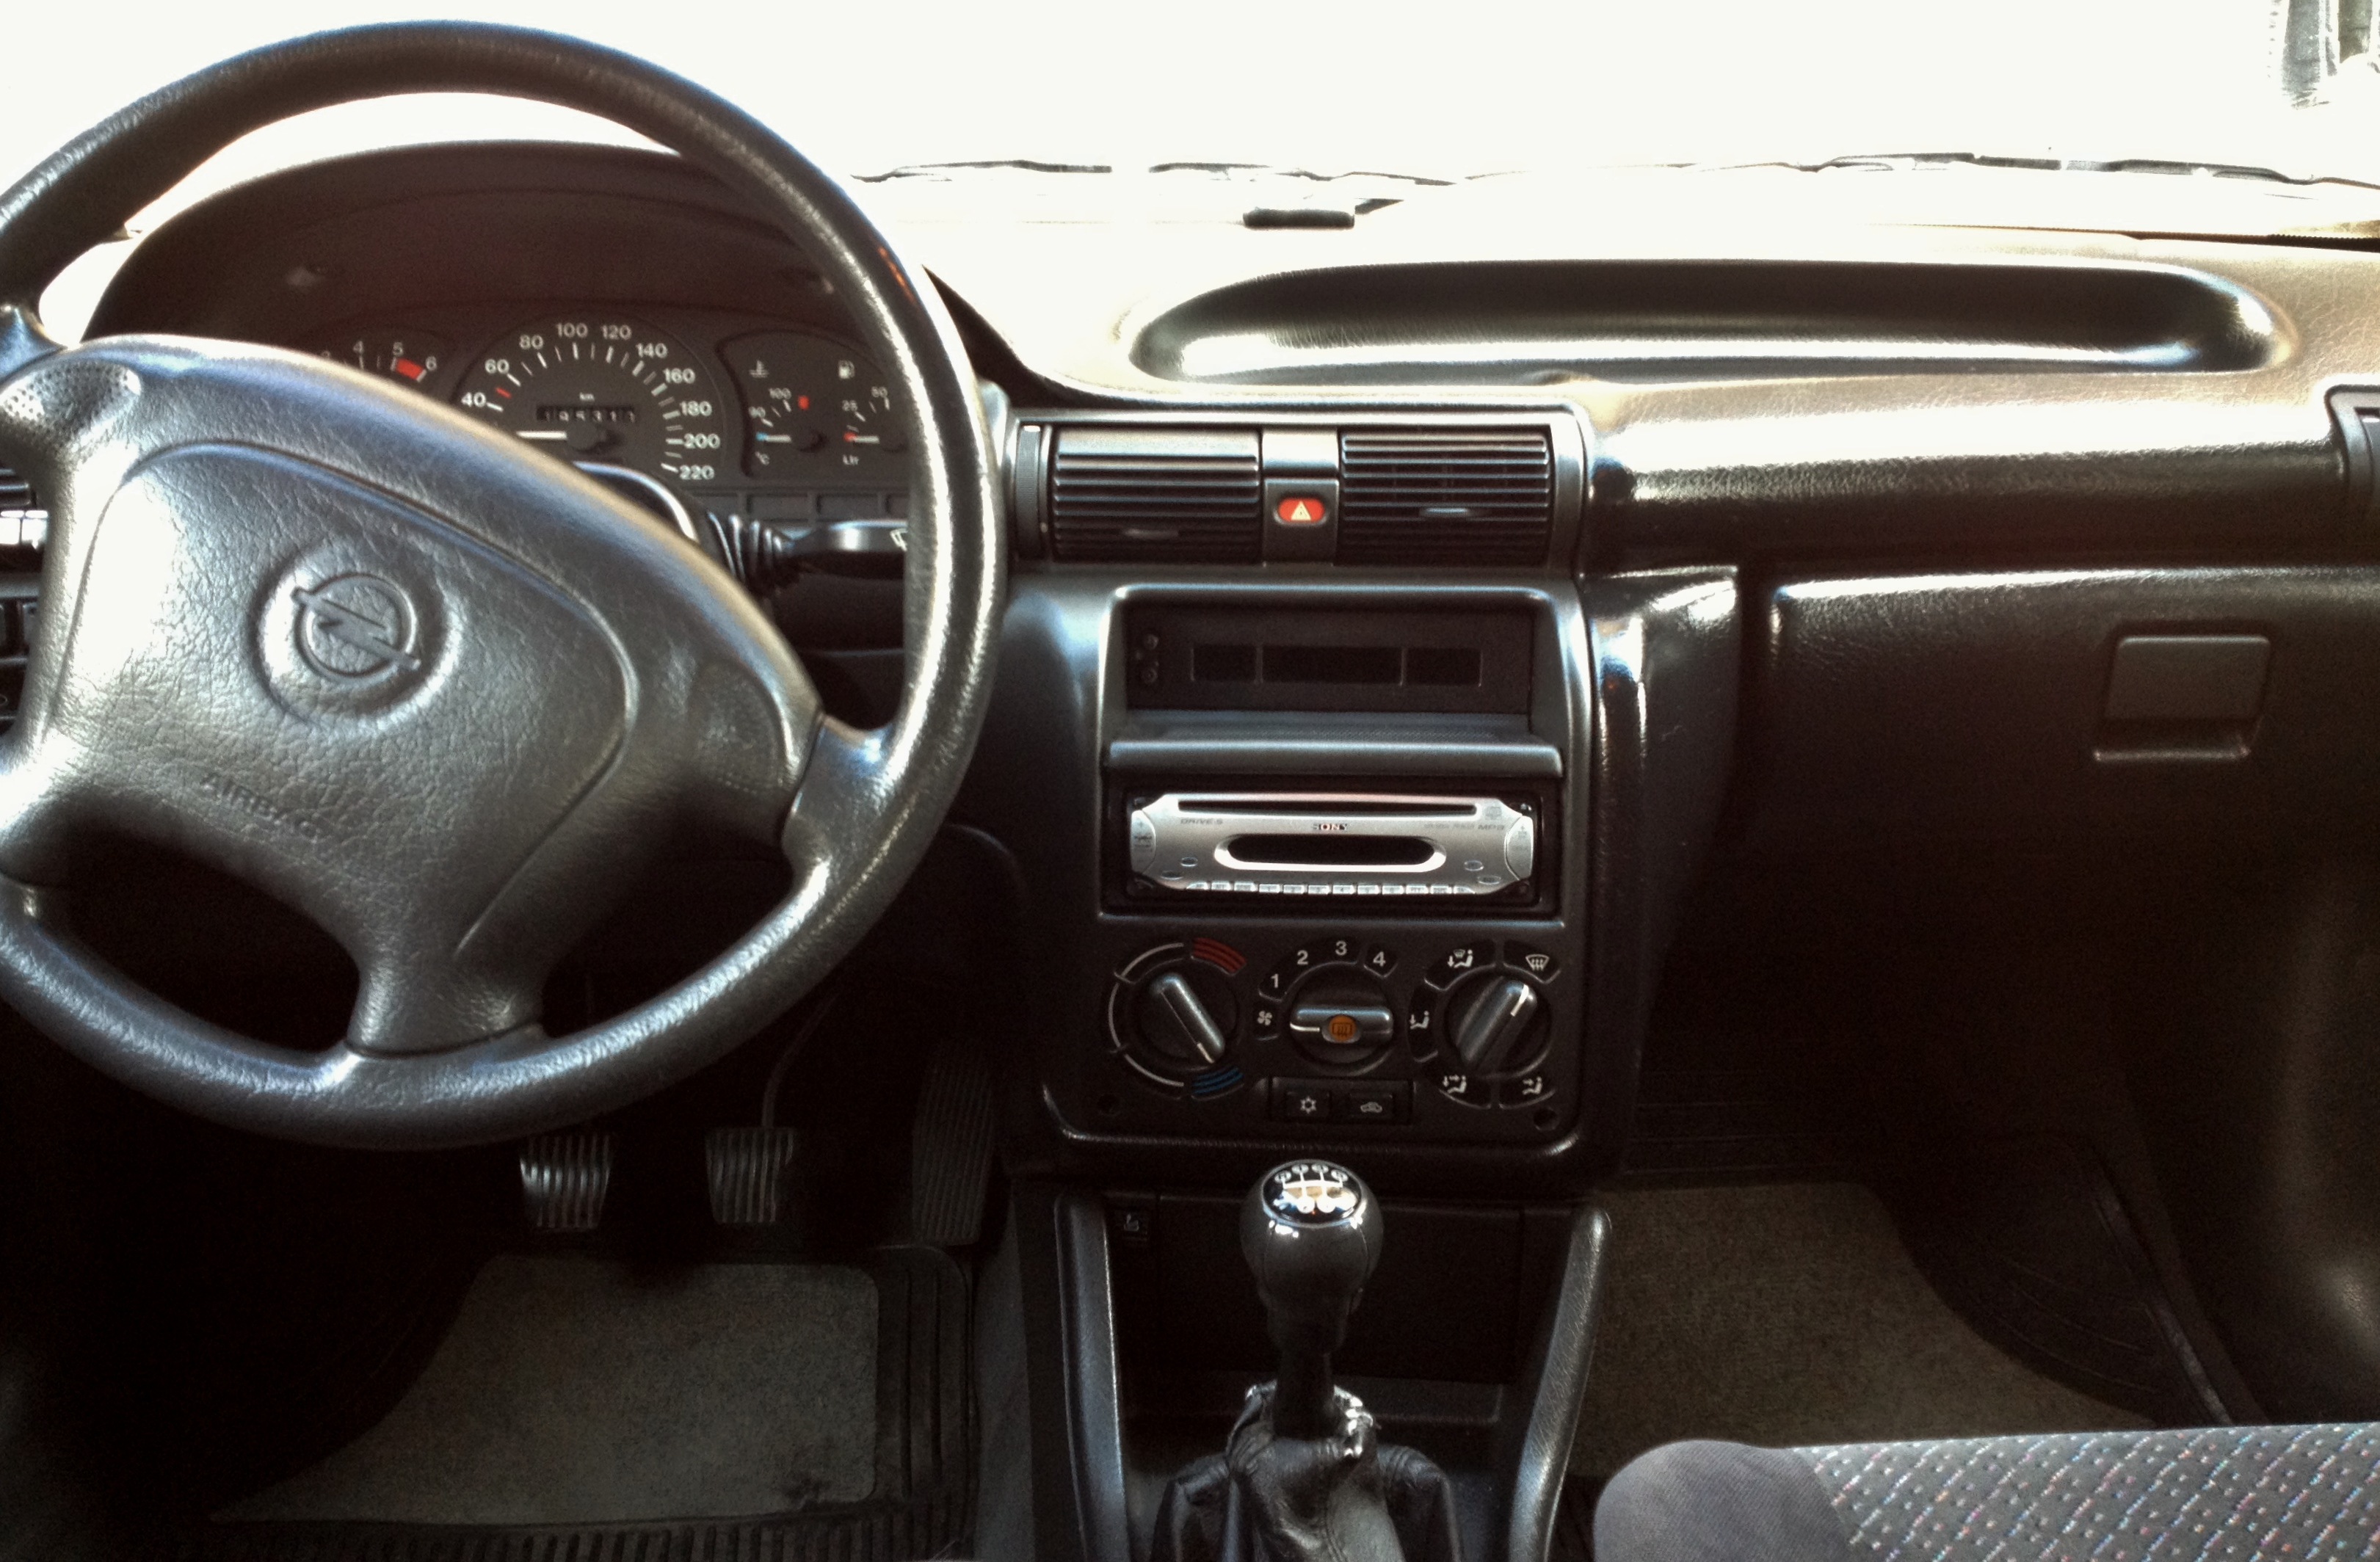 File:Opel Astra F Caravan 1.7 TDS Club interior.JPG - Wikimedia Commons